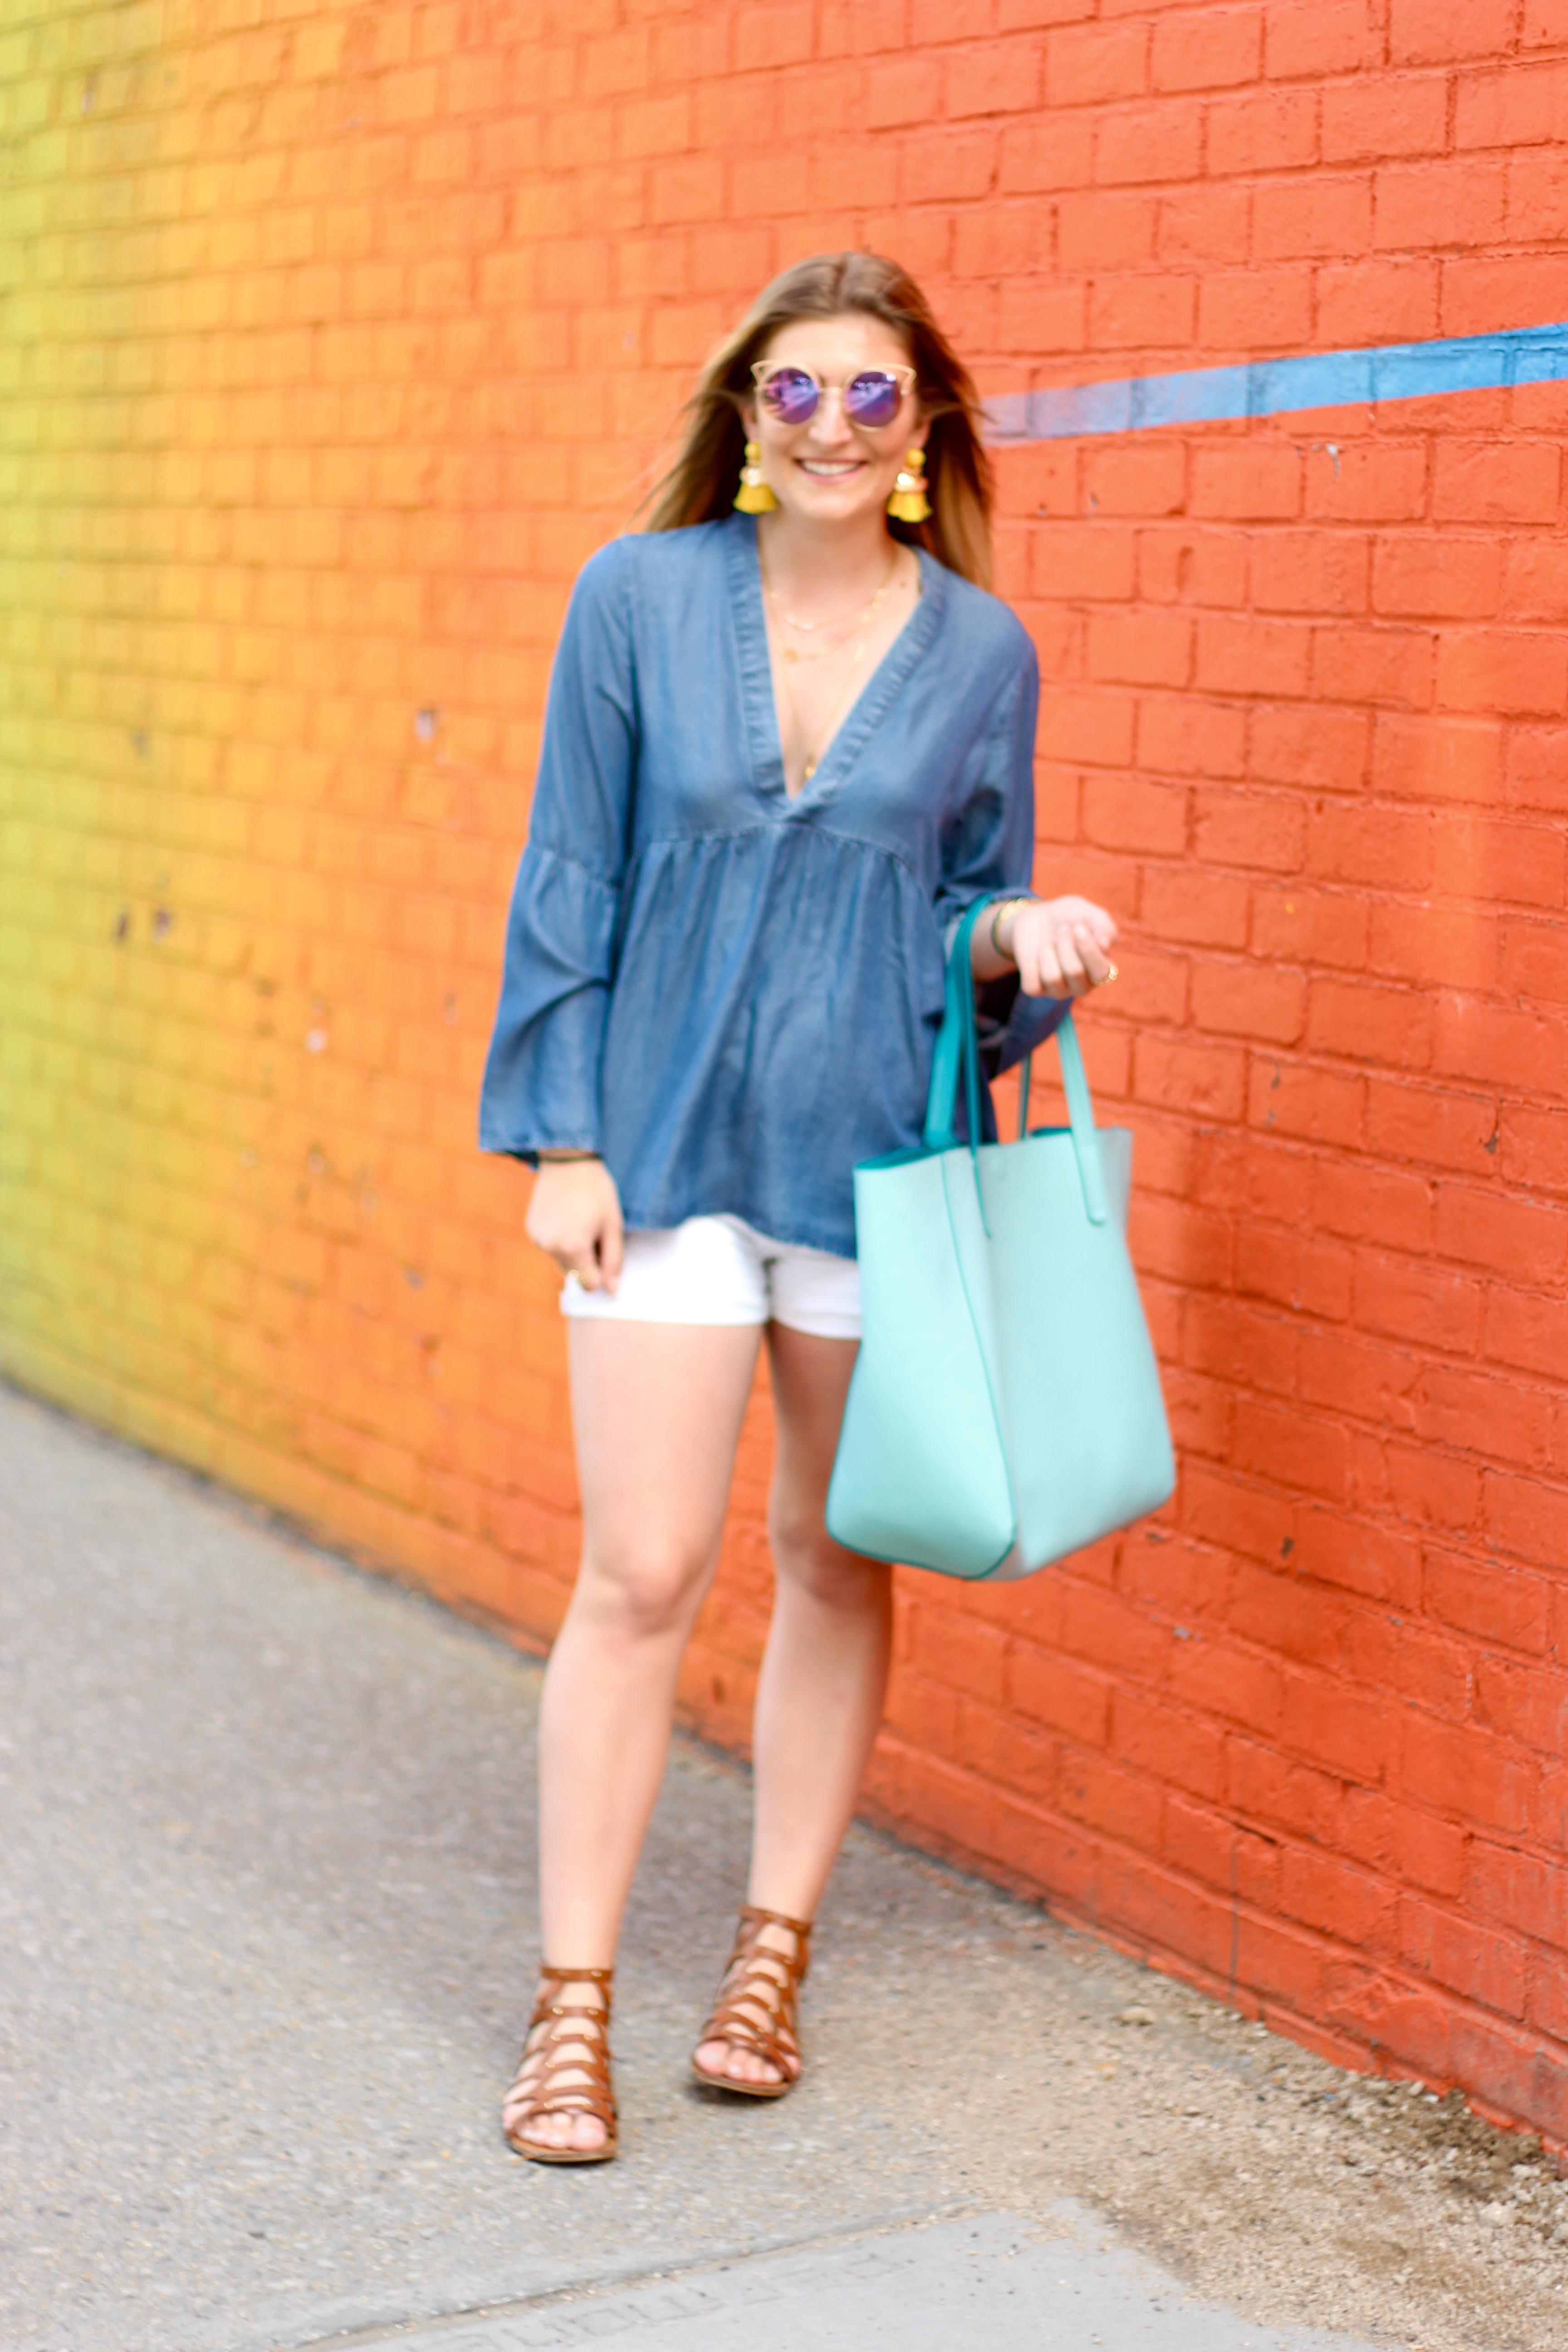 brooklyn dumbo wall fashion | Audrey Madison Stowe Blog